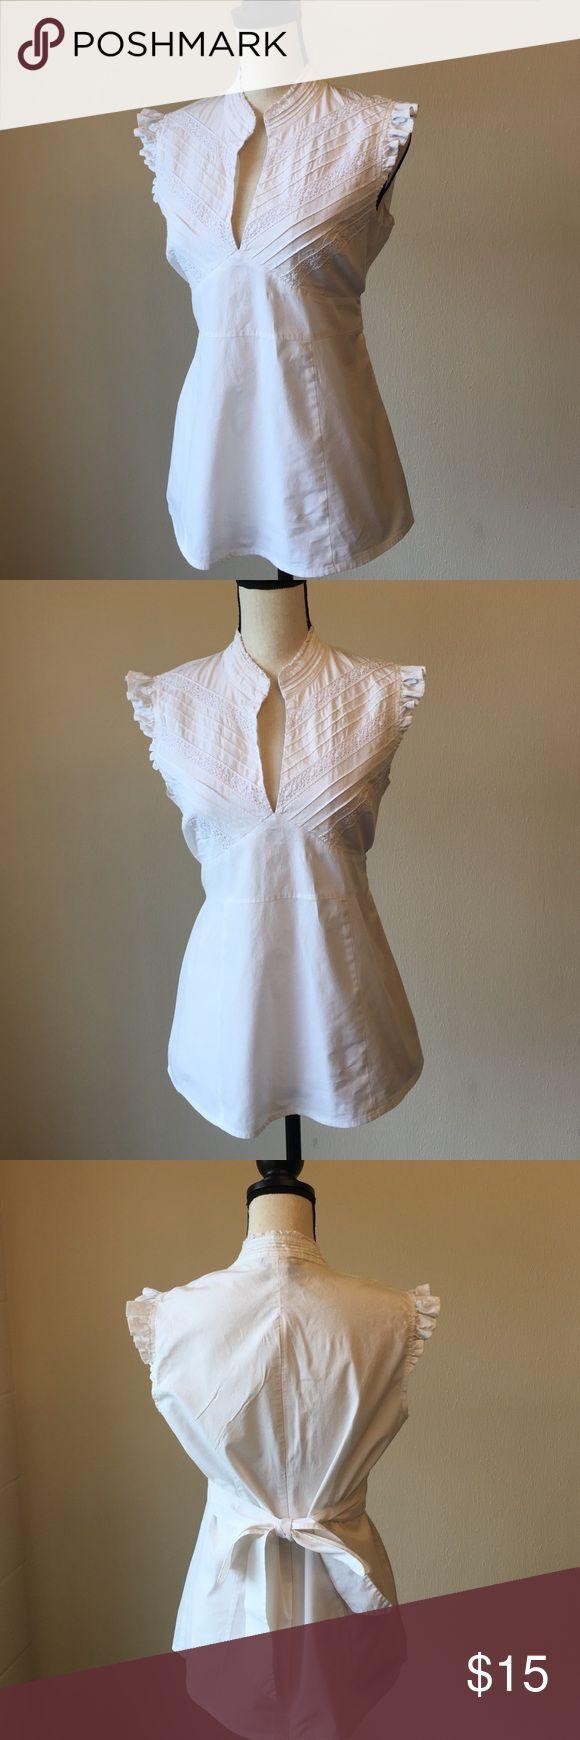 BCBGMAXAZRIA embroidered detail blouse 👚🎀 Good condition. 97% cotton/3% spandex. Zipper in back. BCBGMaxAzria Tops Blouses